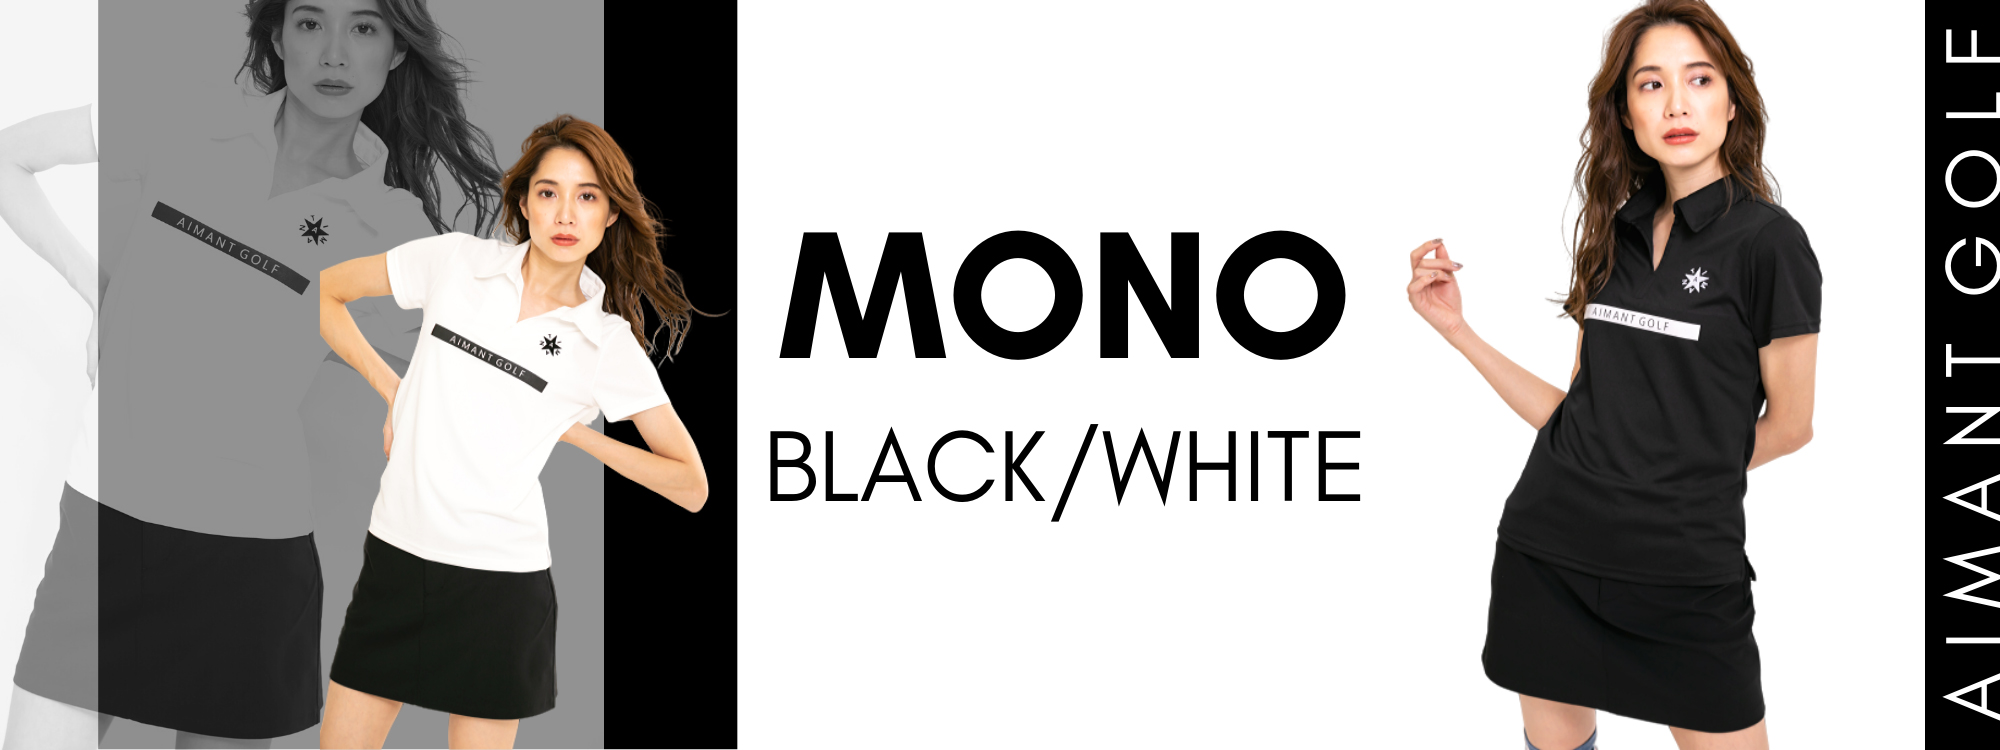 MONO BLACK/WHITE